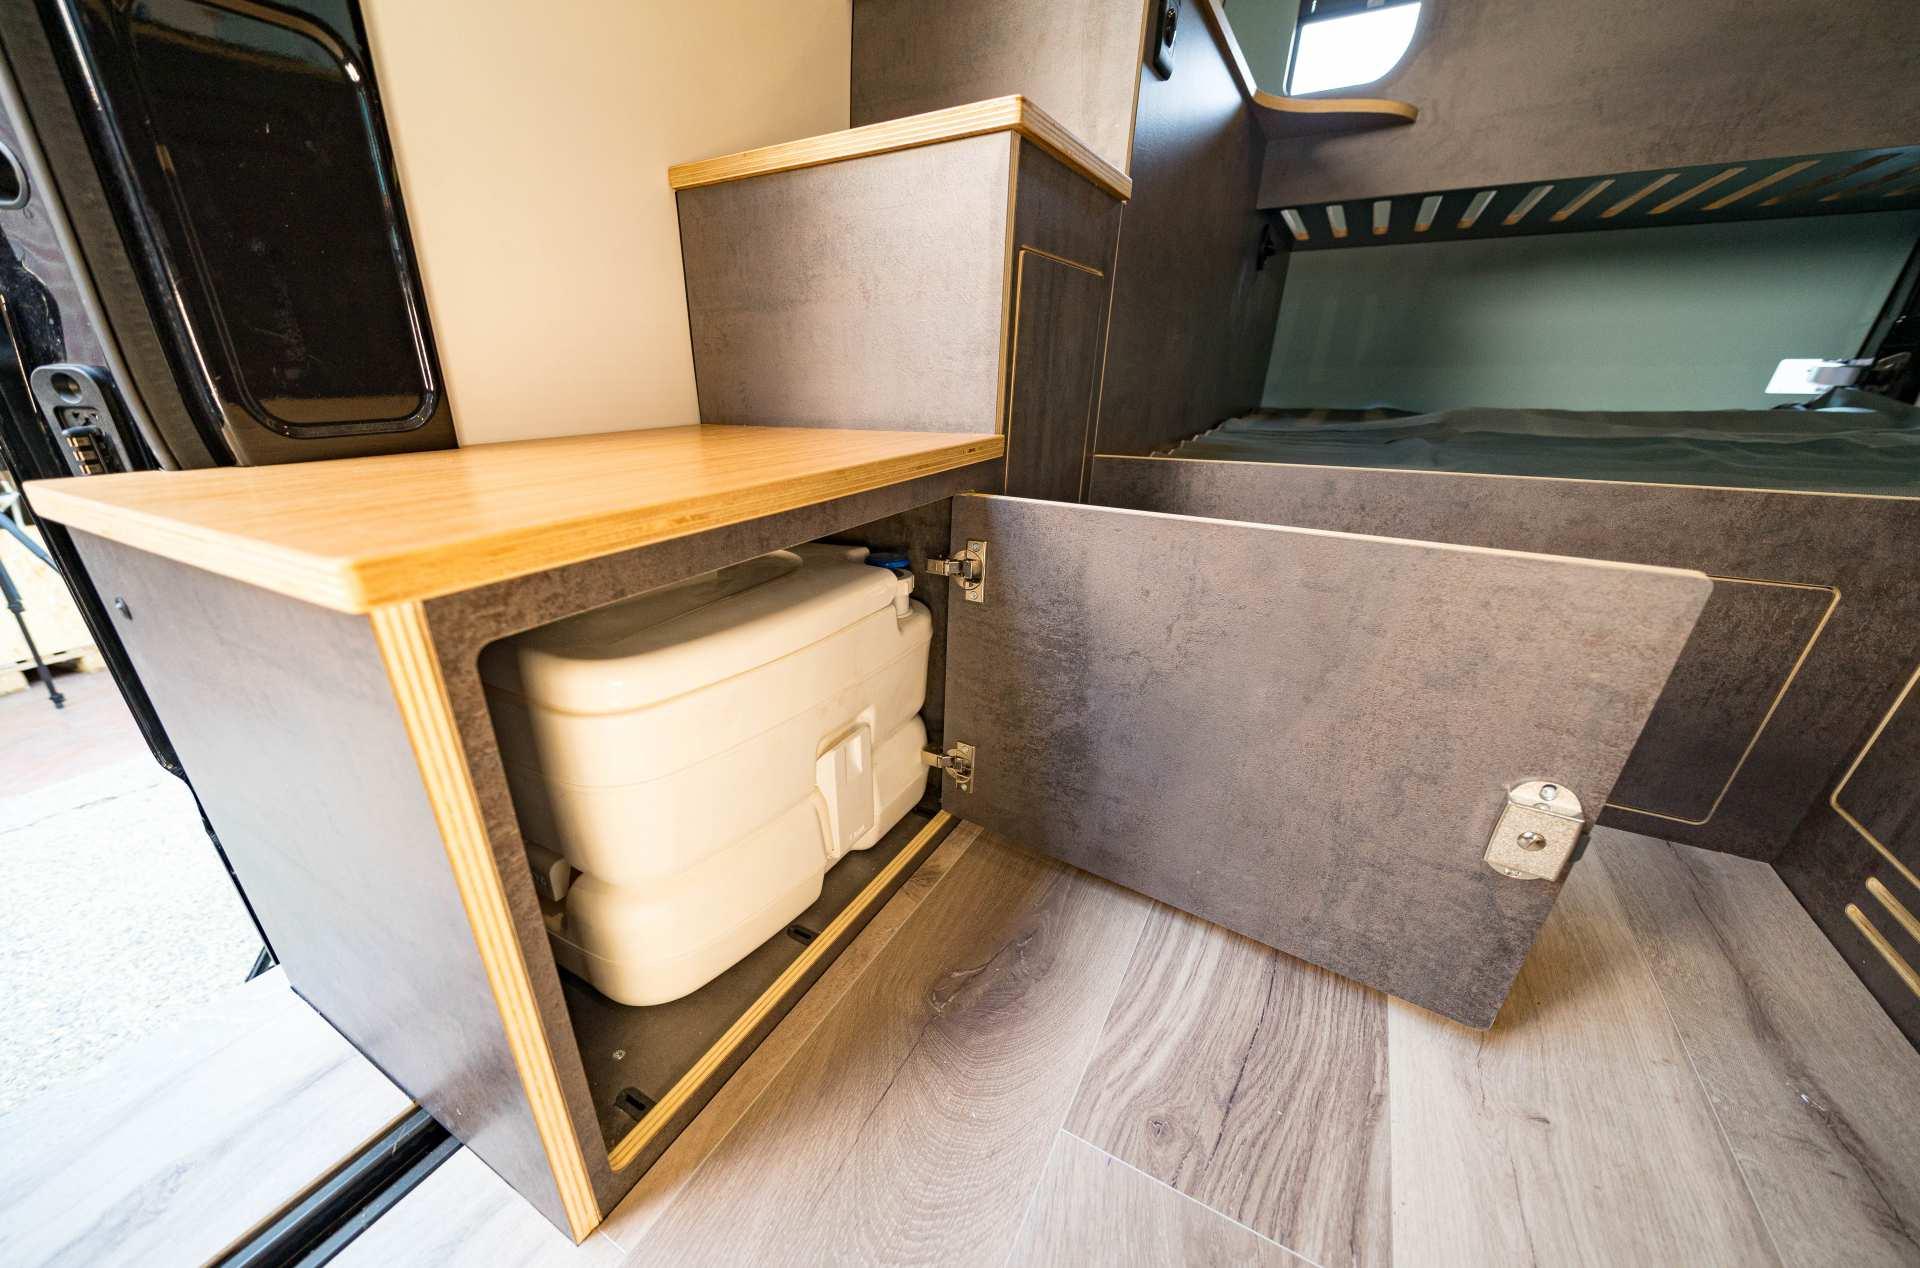 Individualausbau: Full House VW Crafter - 15